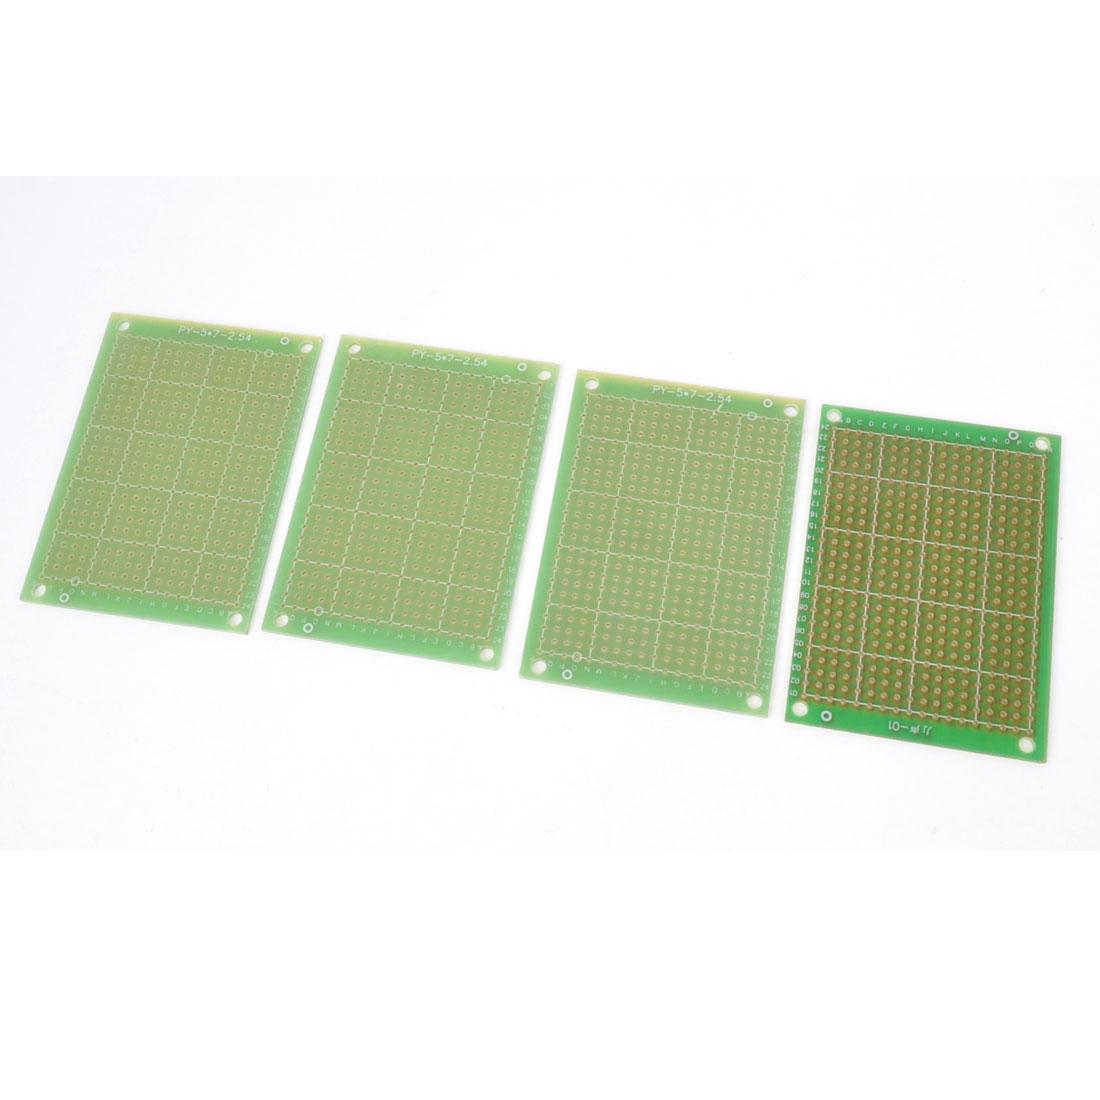 4 Pcs Copper Plated Prototype PCB Board Universal Stripboard Veroboard 7cmx5cm